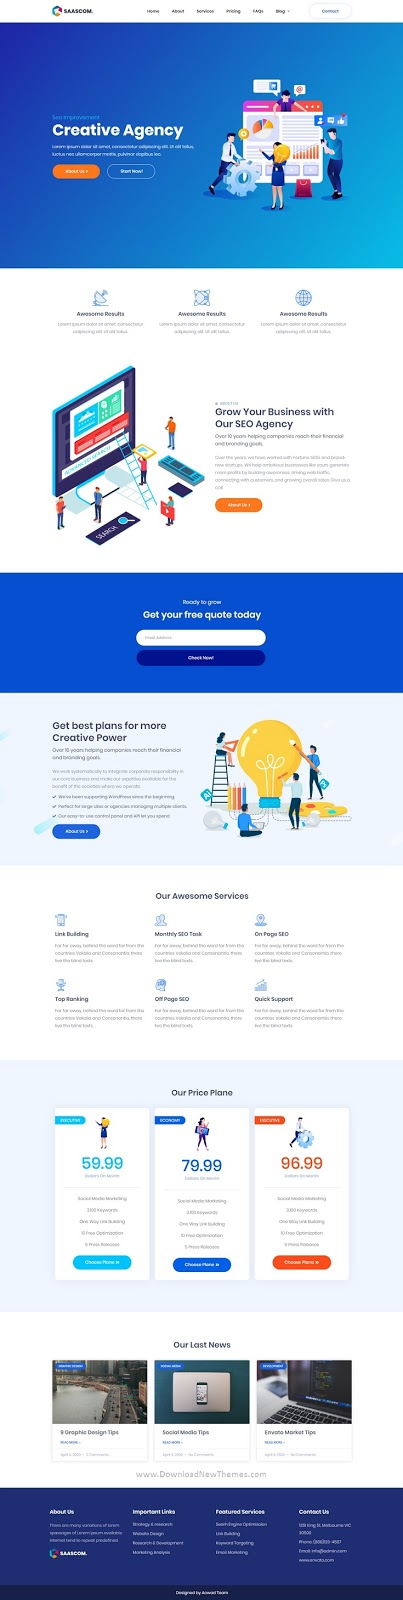 Digital Marketing & SEO Agency Template